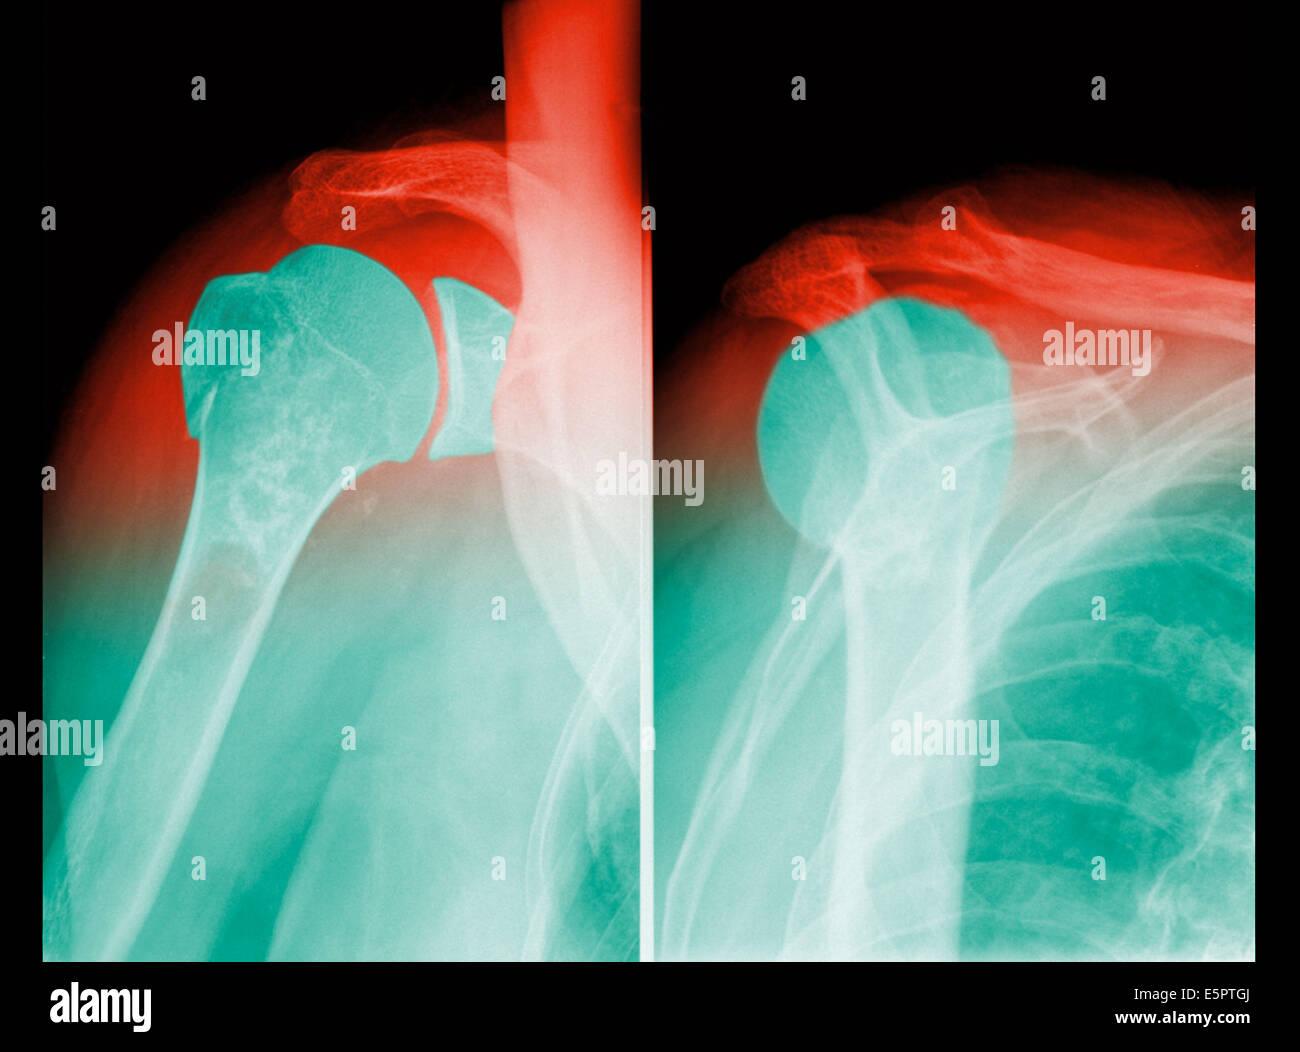 Dislocation Shoulder X Ray Stock Photos & Dislocation Shoulder X Ray ...